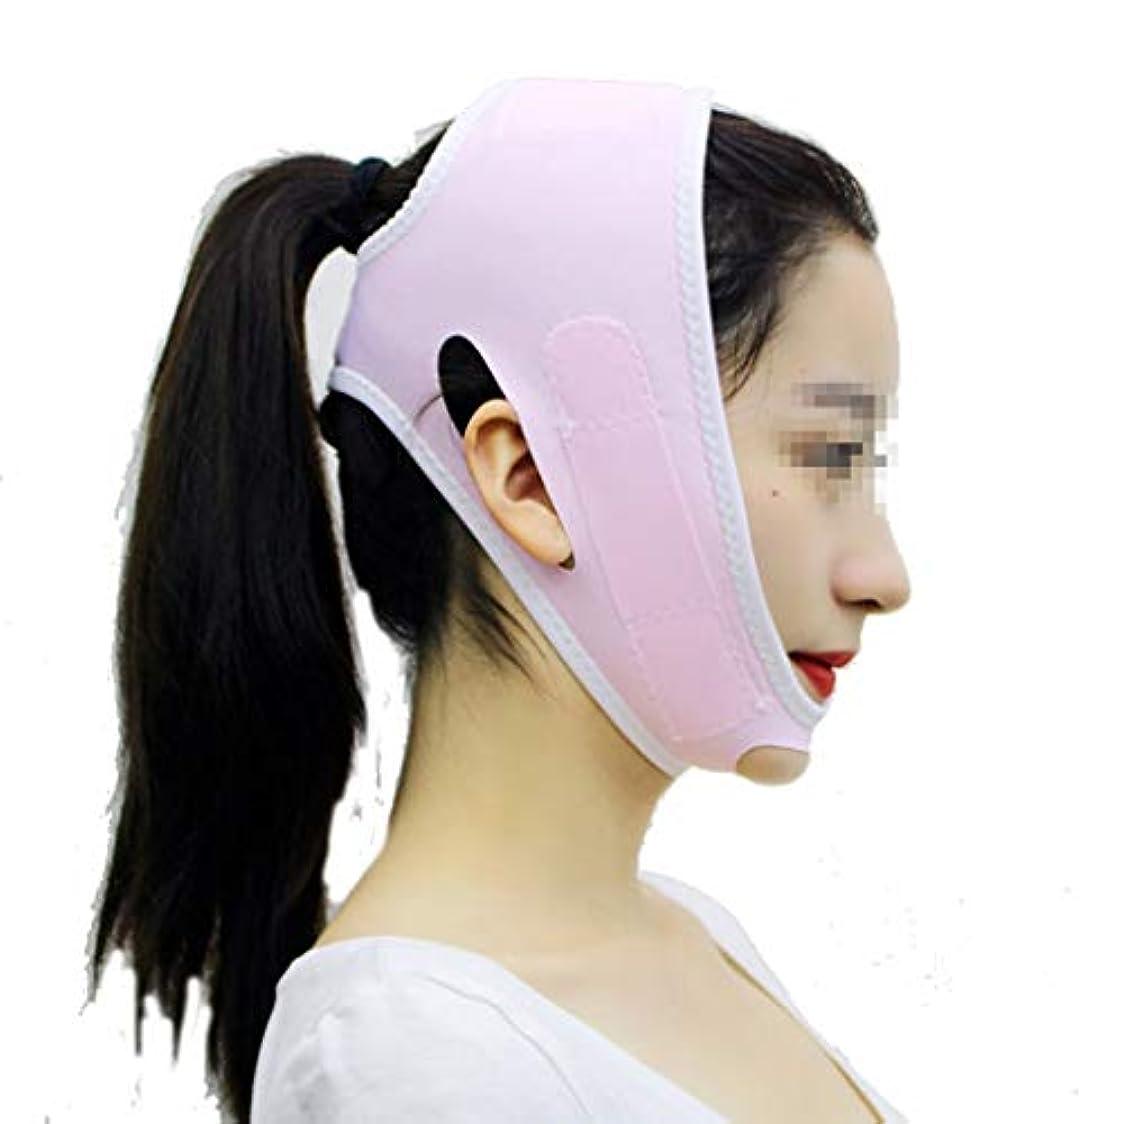 XHLMRMJ 美容包帯、vフェイス睡眠薄いフェイスマスクライン彫刻回復フードリフティング引き締めフェイスダブルチンマスクマルチカラーオプション (Color : Pink)